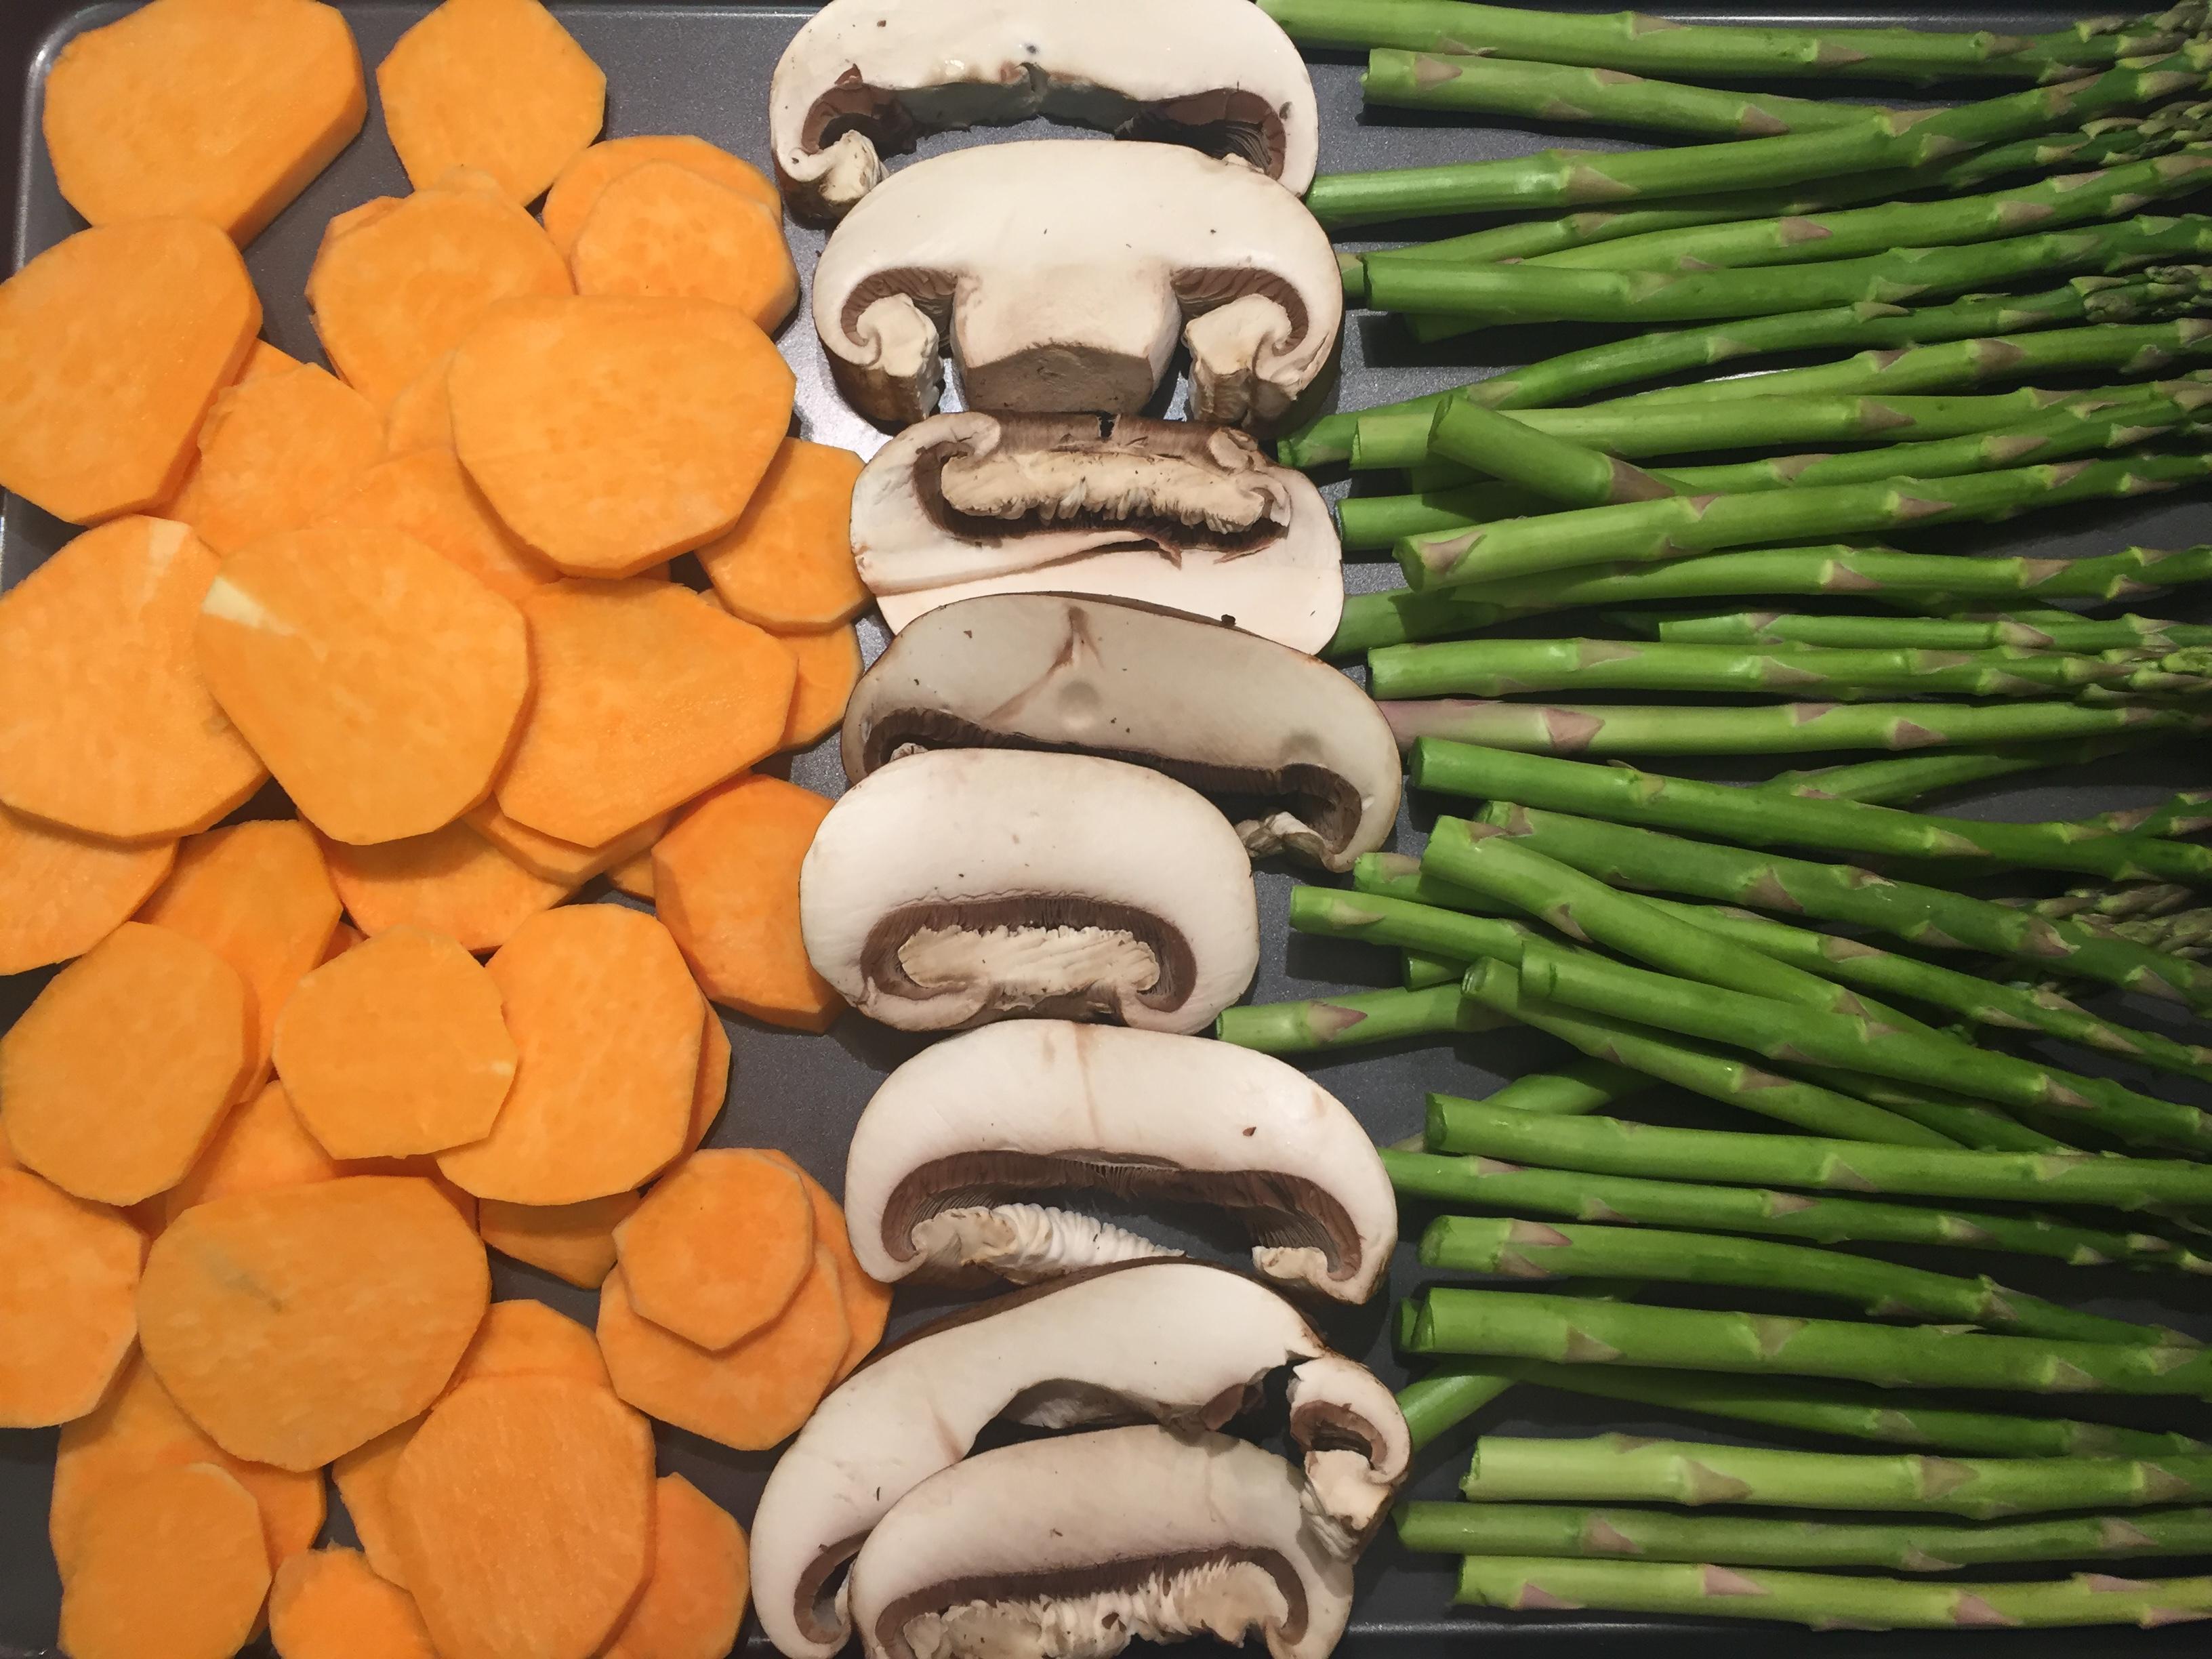 Roast Remaining Mushroom And Add Vegetables To Enhance The Dinner